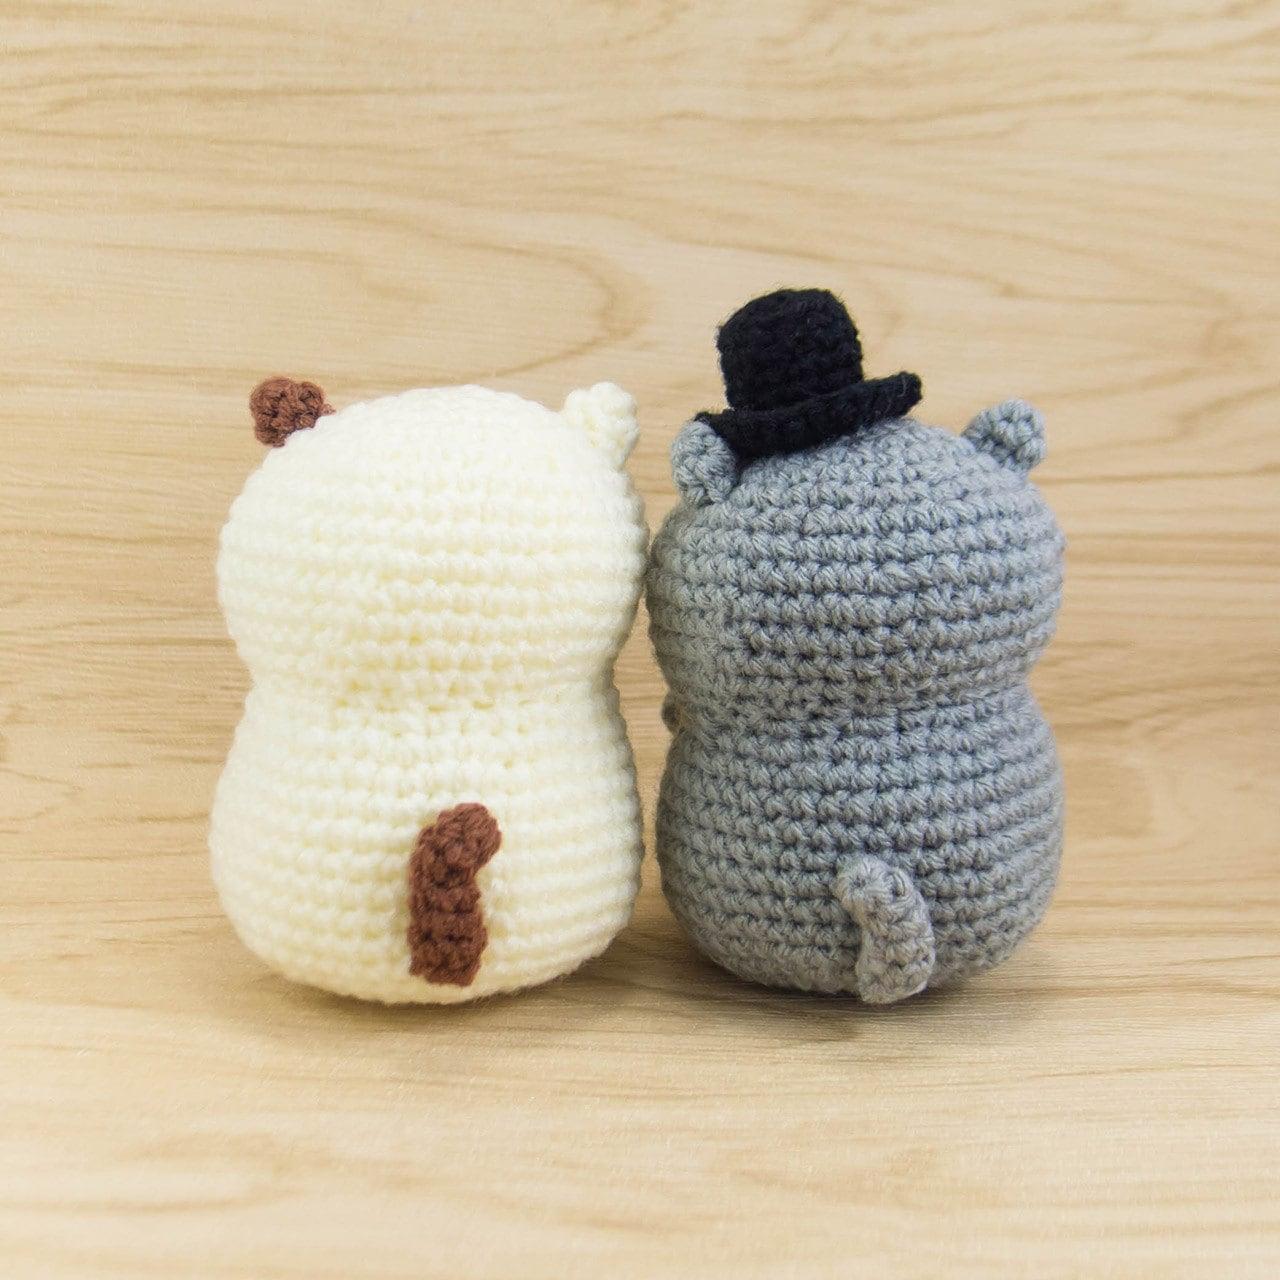 Cat Crochet Pattern - Amigurumi Cat Pattern - Crochet Cat Couple ...